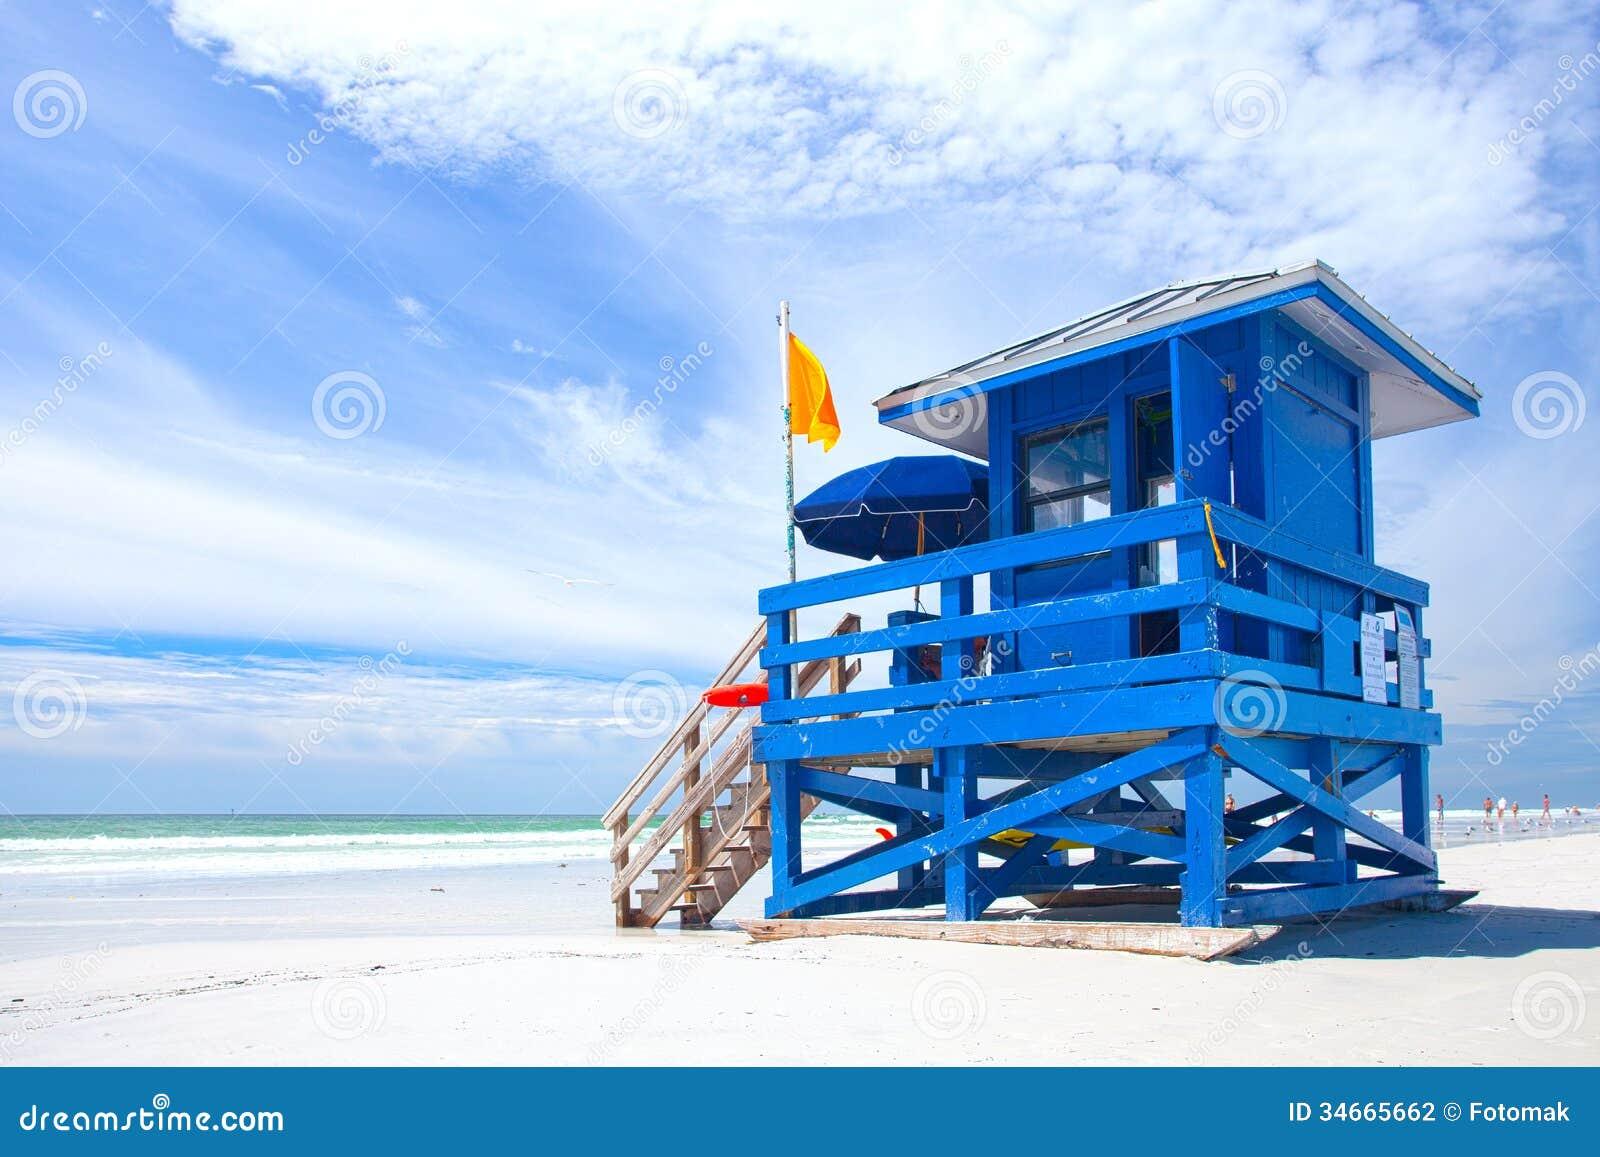 The Blue Beach House Siesta Key